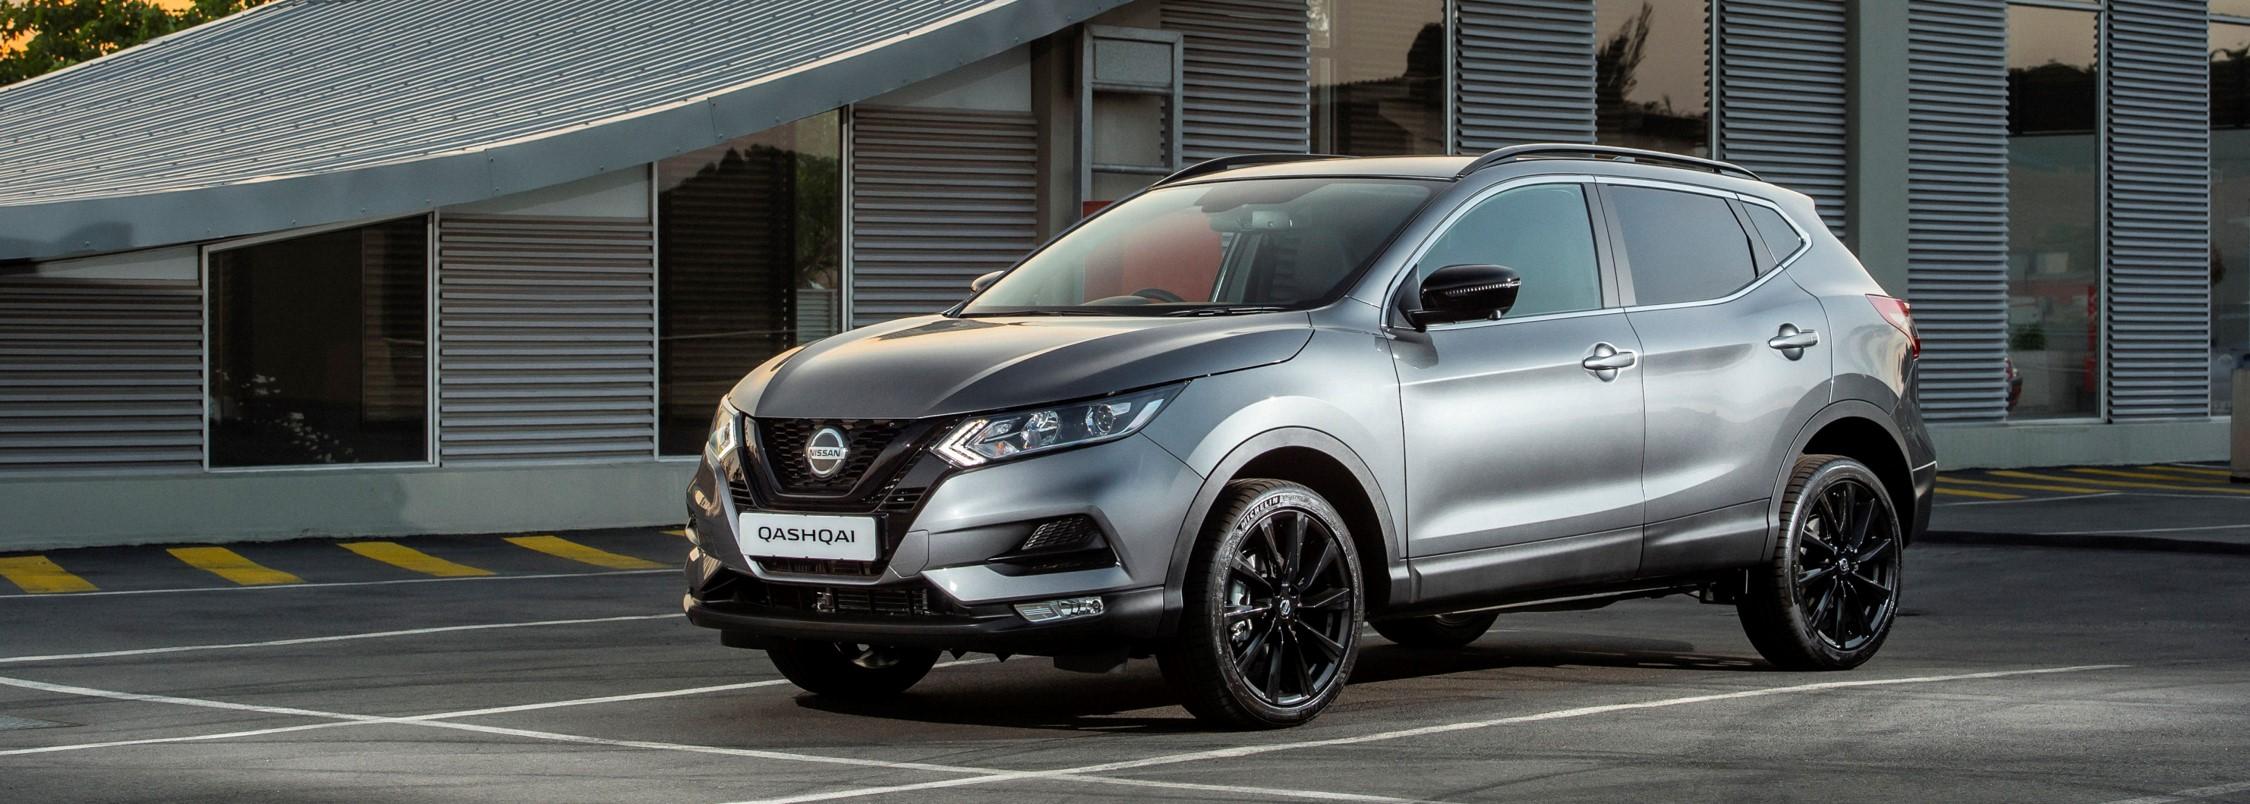 Nissan adds Midnight Edition to Qashqai range video-banner